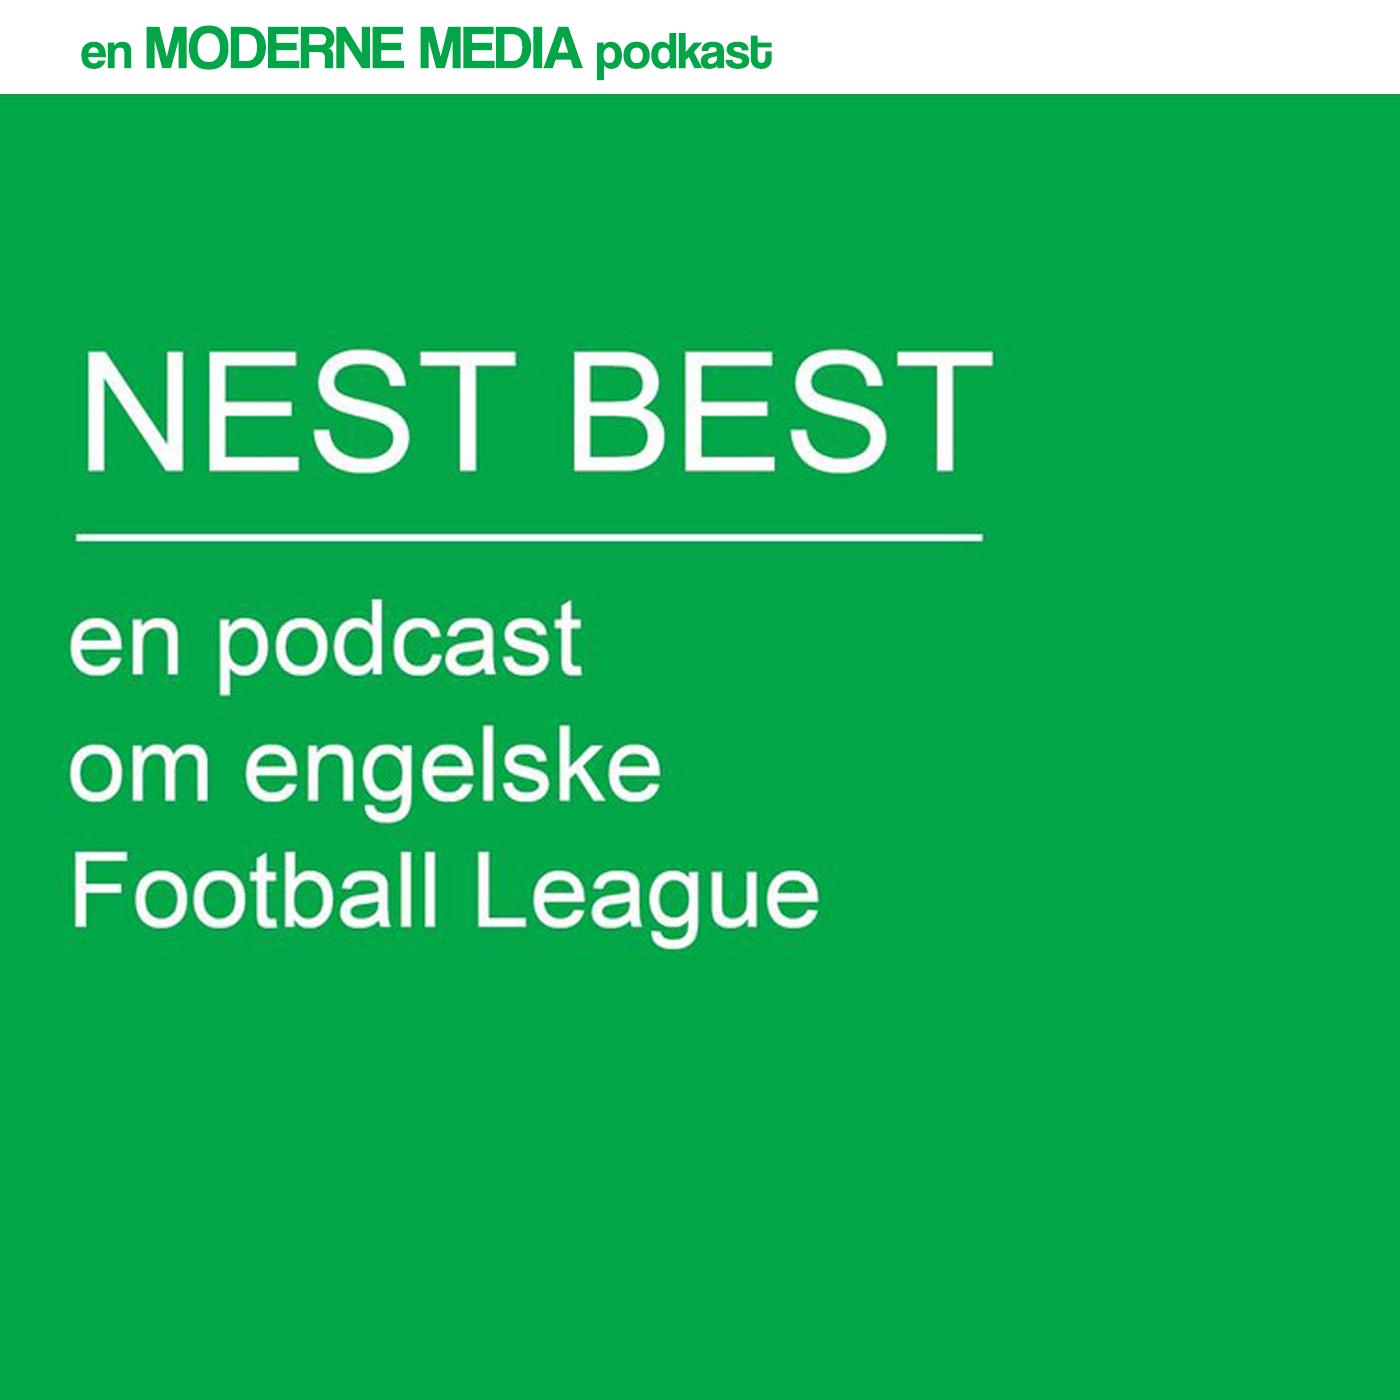 Nest best